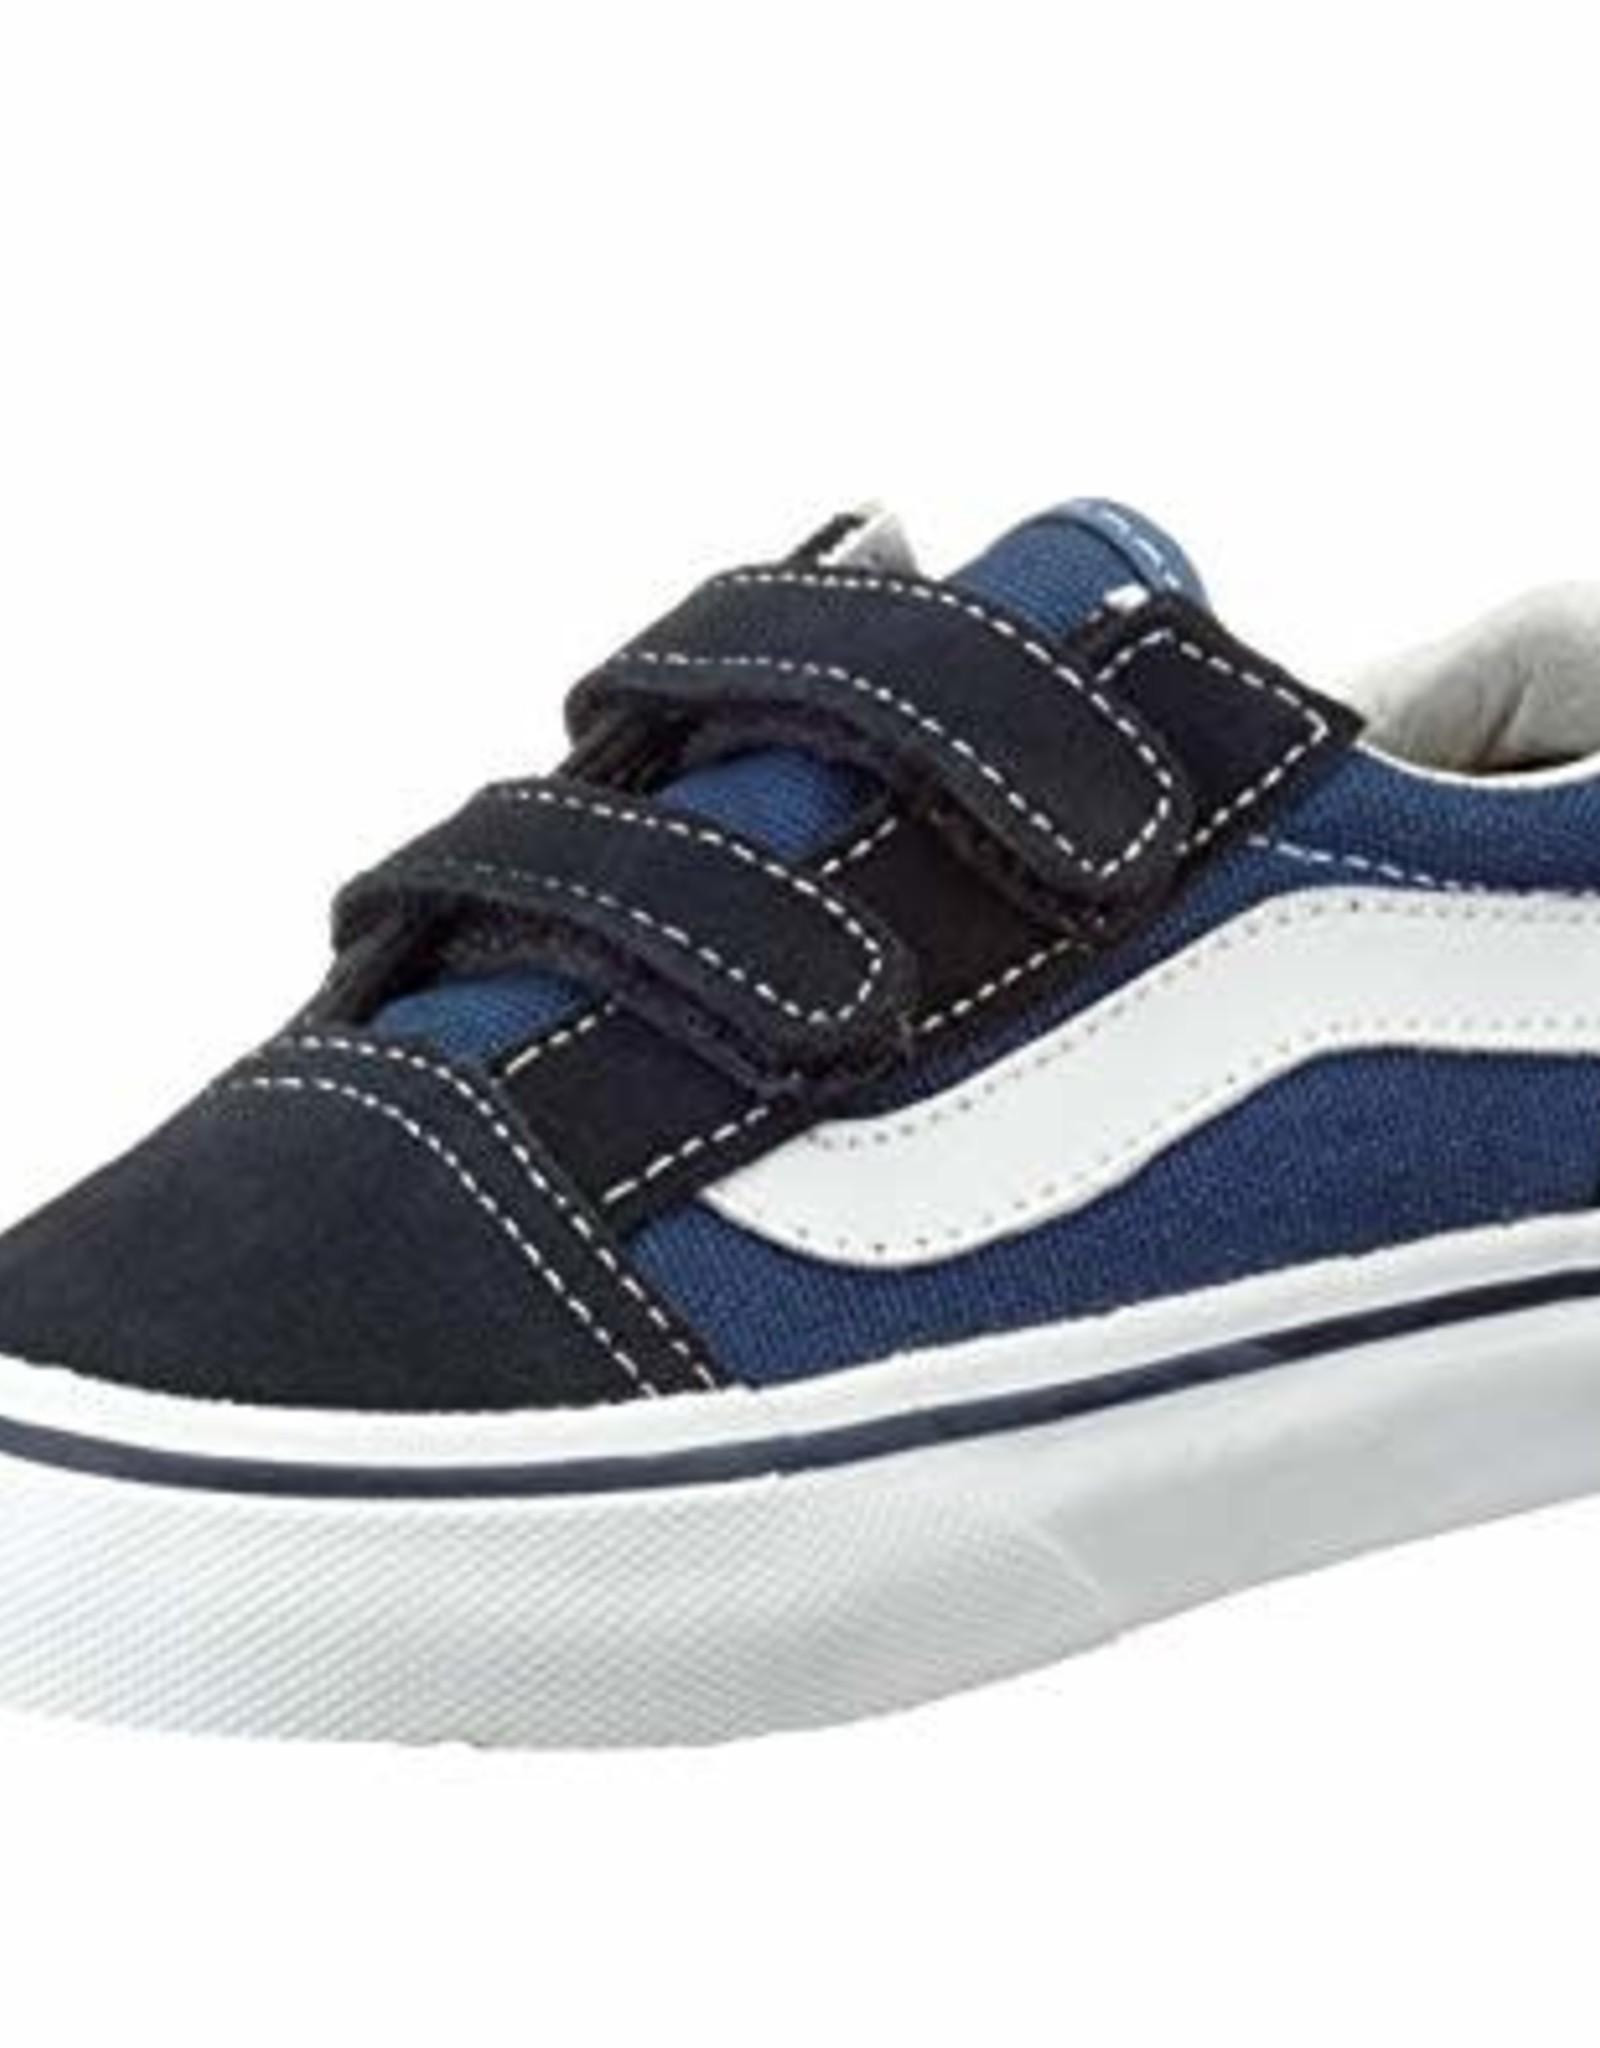 Vans Vans - Yth OLD SKOOL VELCRO - Blk/Wht/Navy -